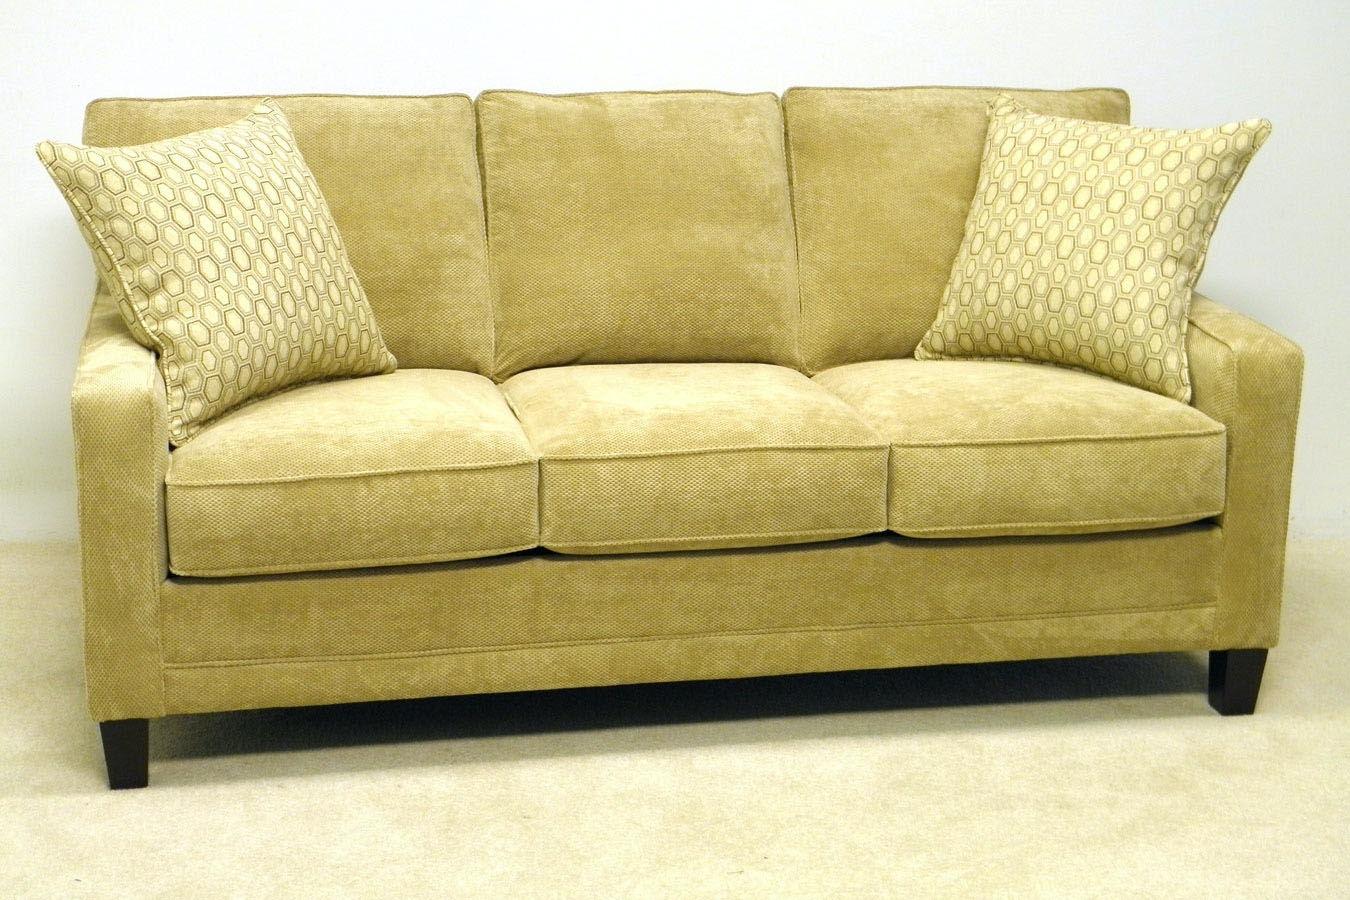 Lacrosse living room 75 39 39 no sag sofa 6665lc summit for Living room no sofa